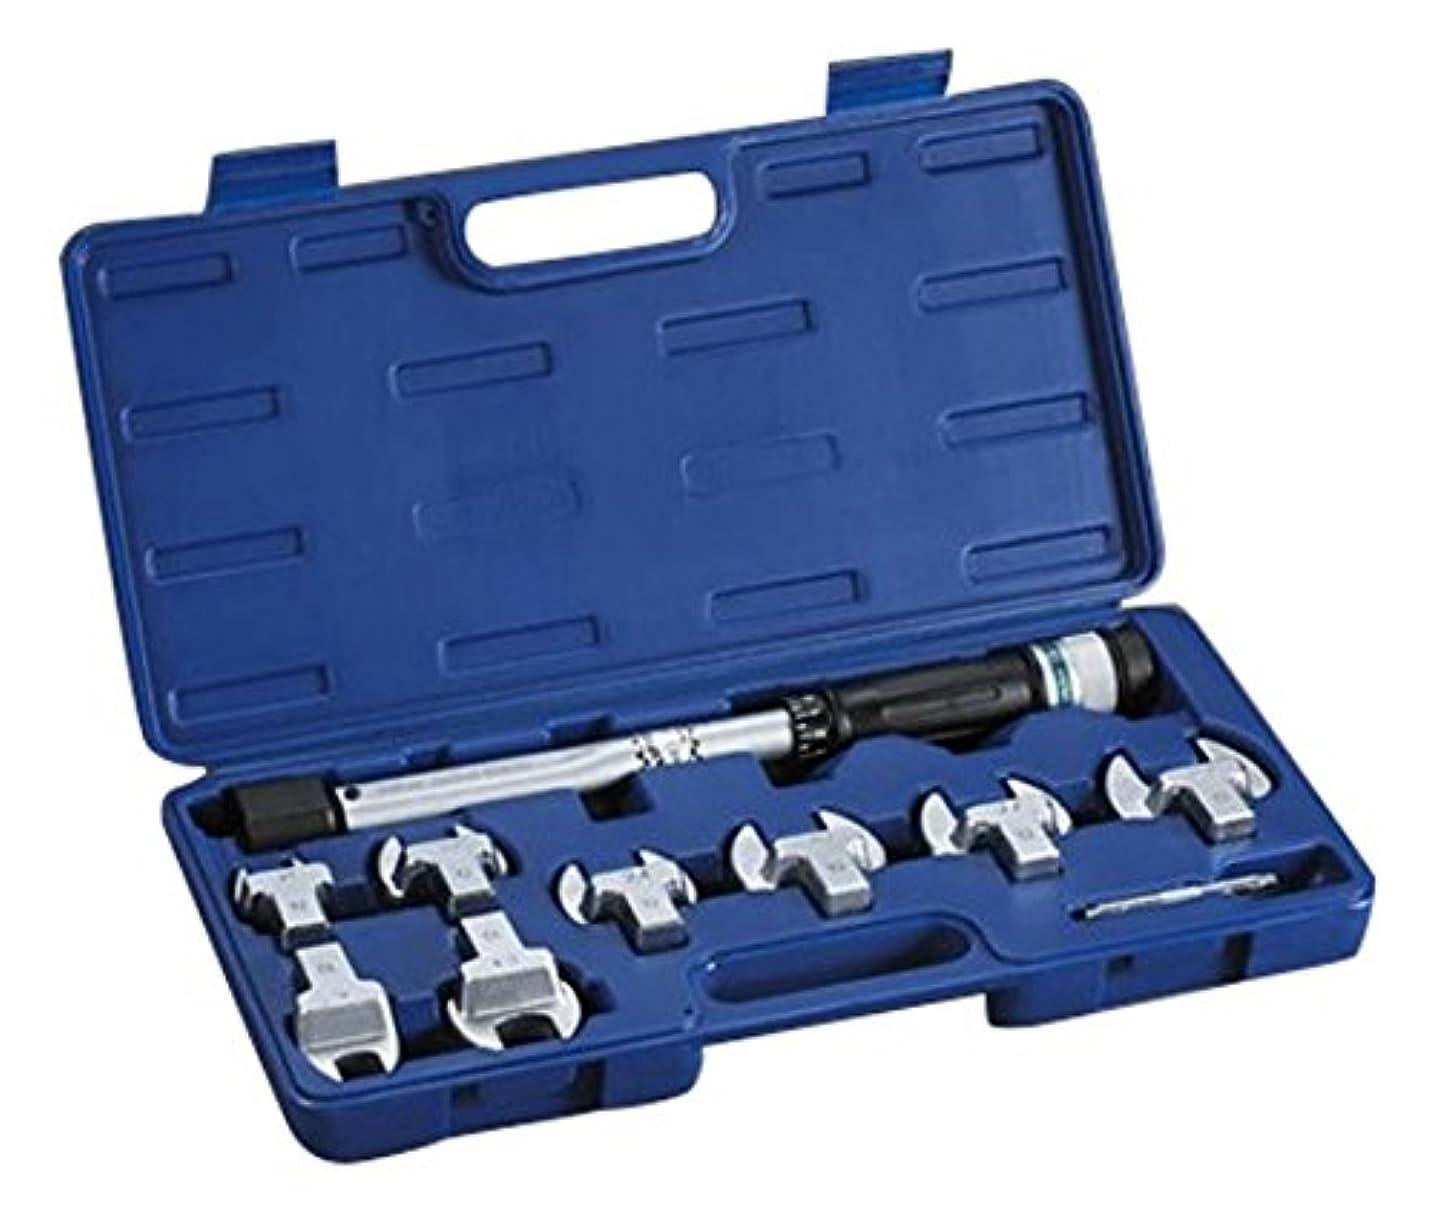 YELLOW JACKET 60652 Eight Head Torque Wrench Kit jfqrffzns